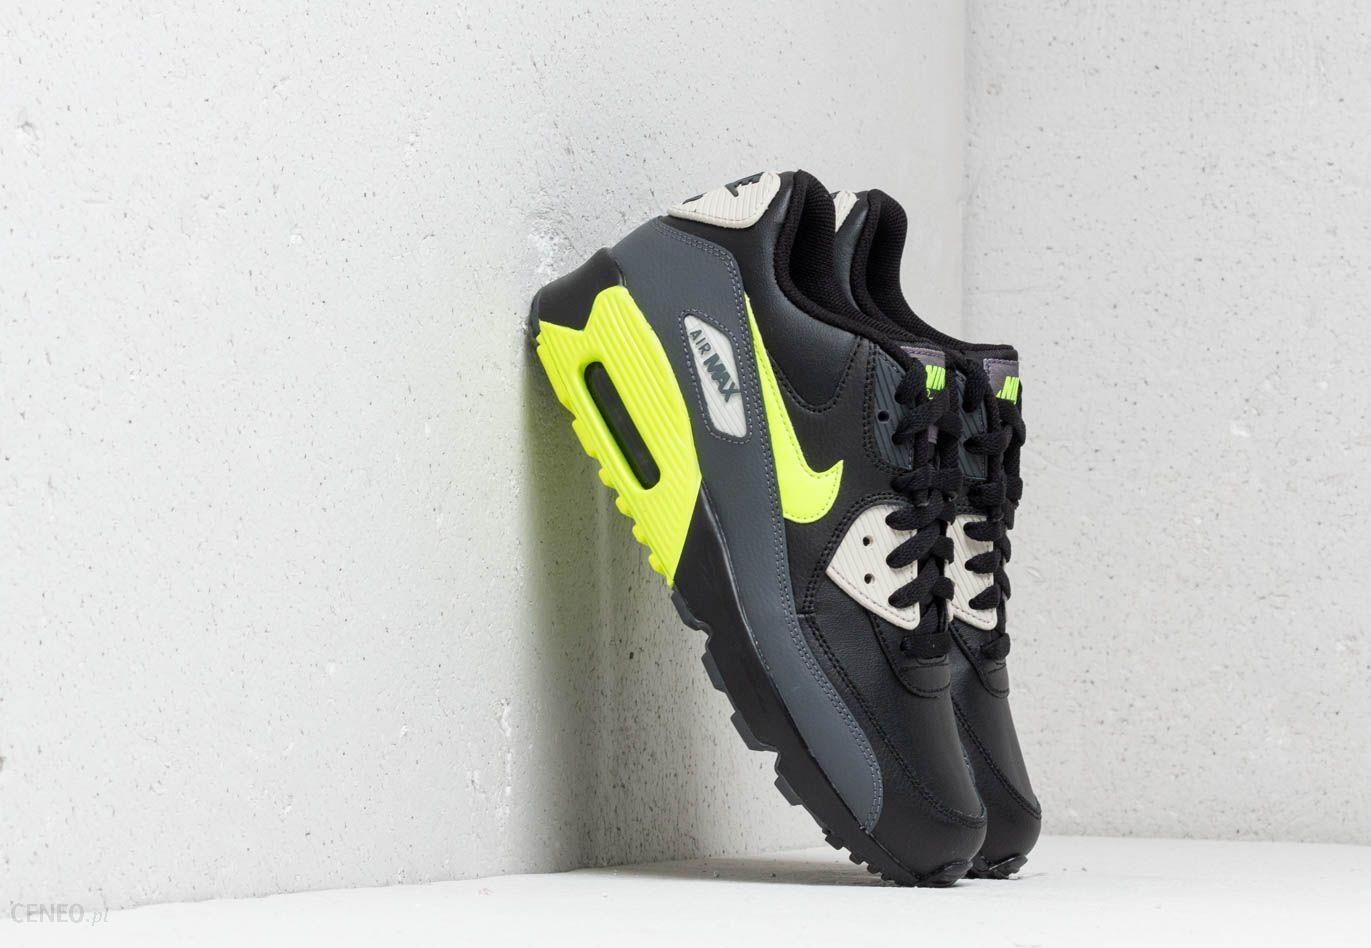 Nike Air Max 90 Leather (GS) Dark Grey Vold Black